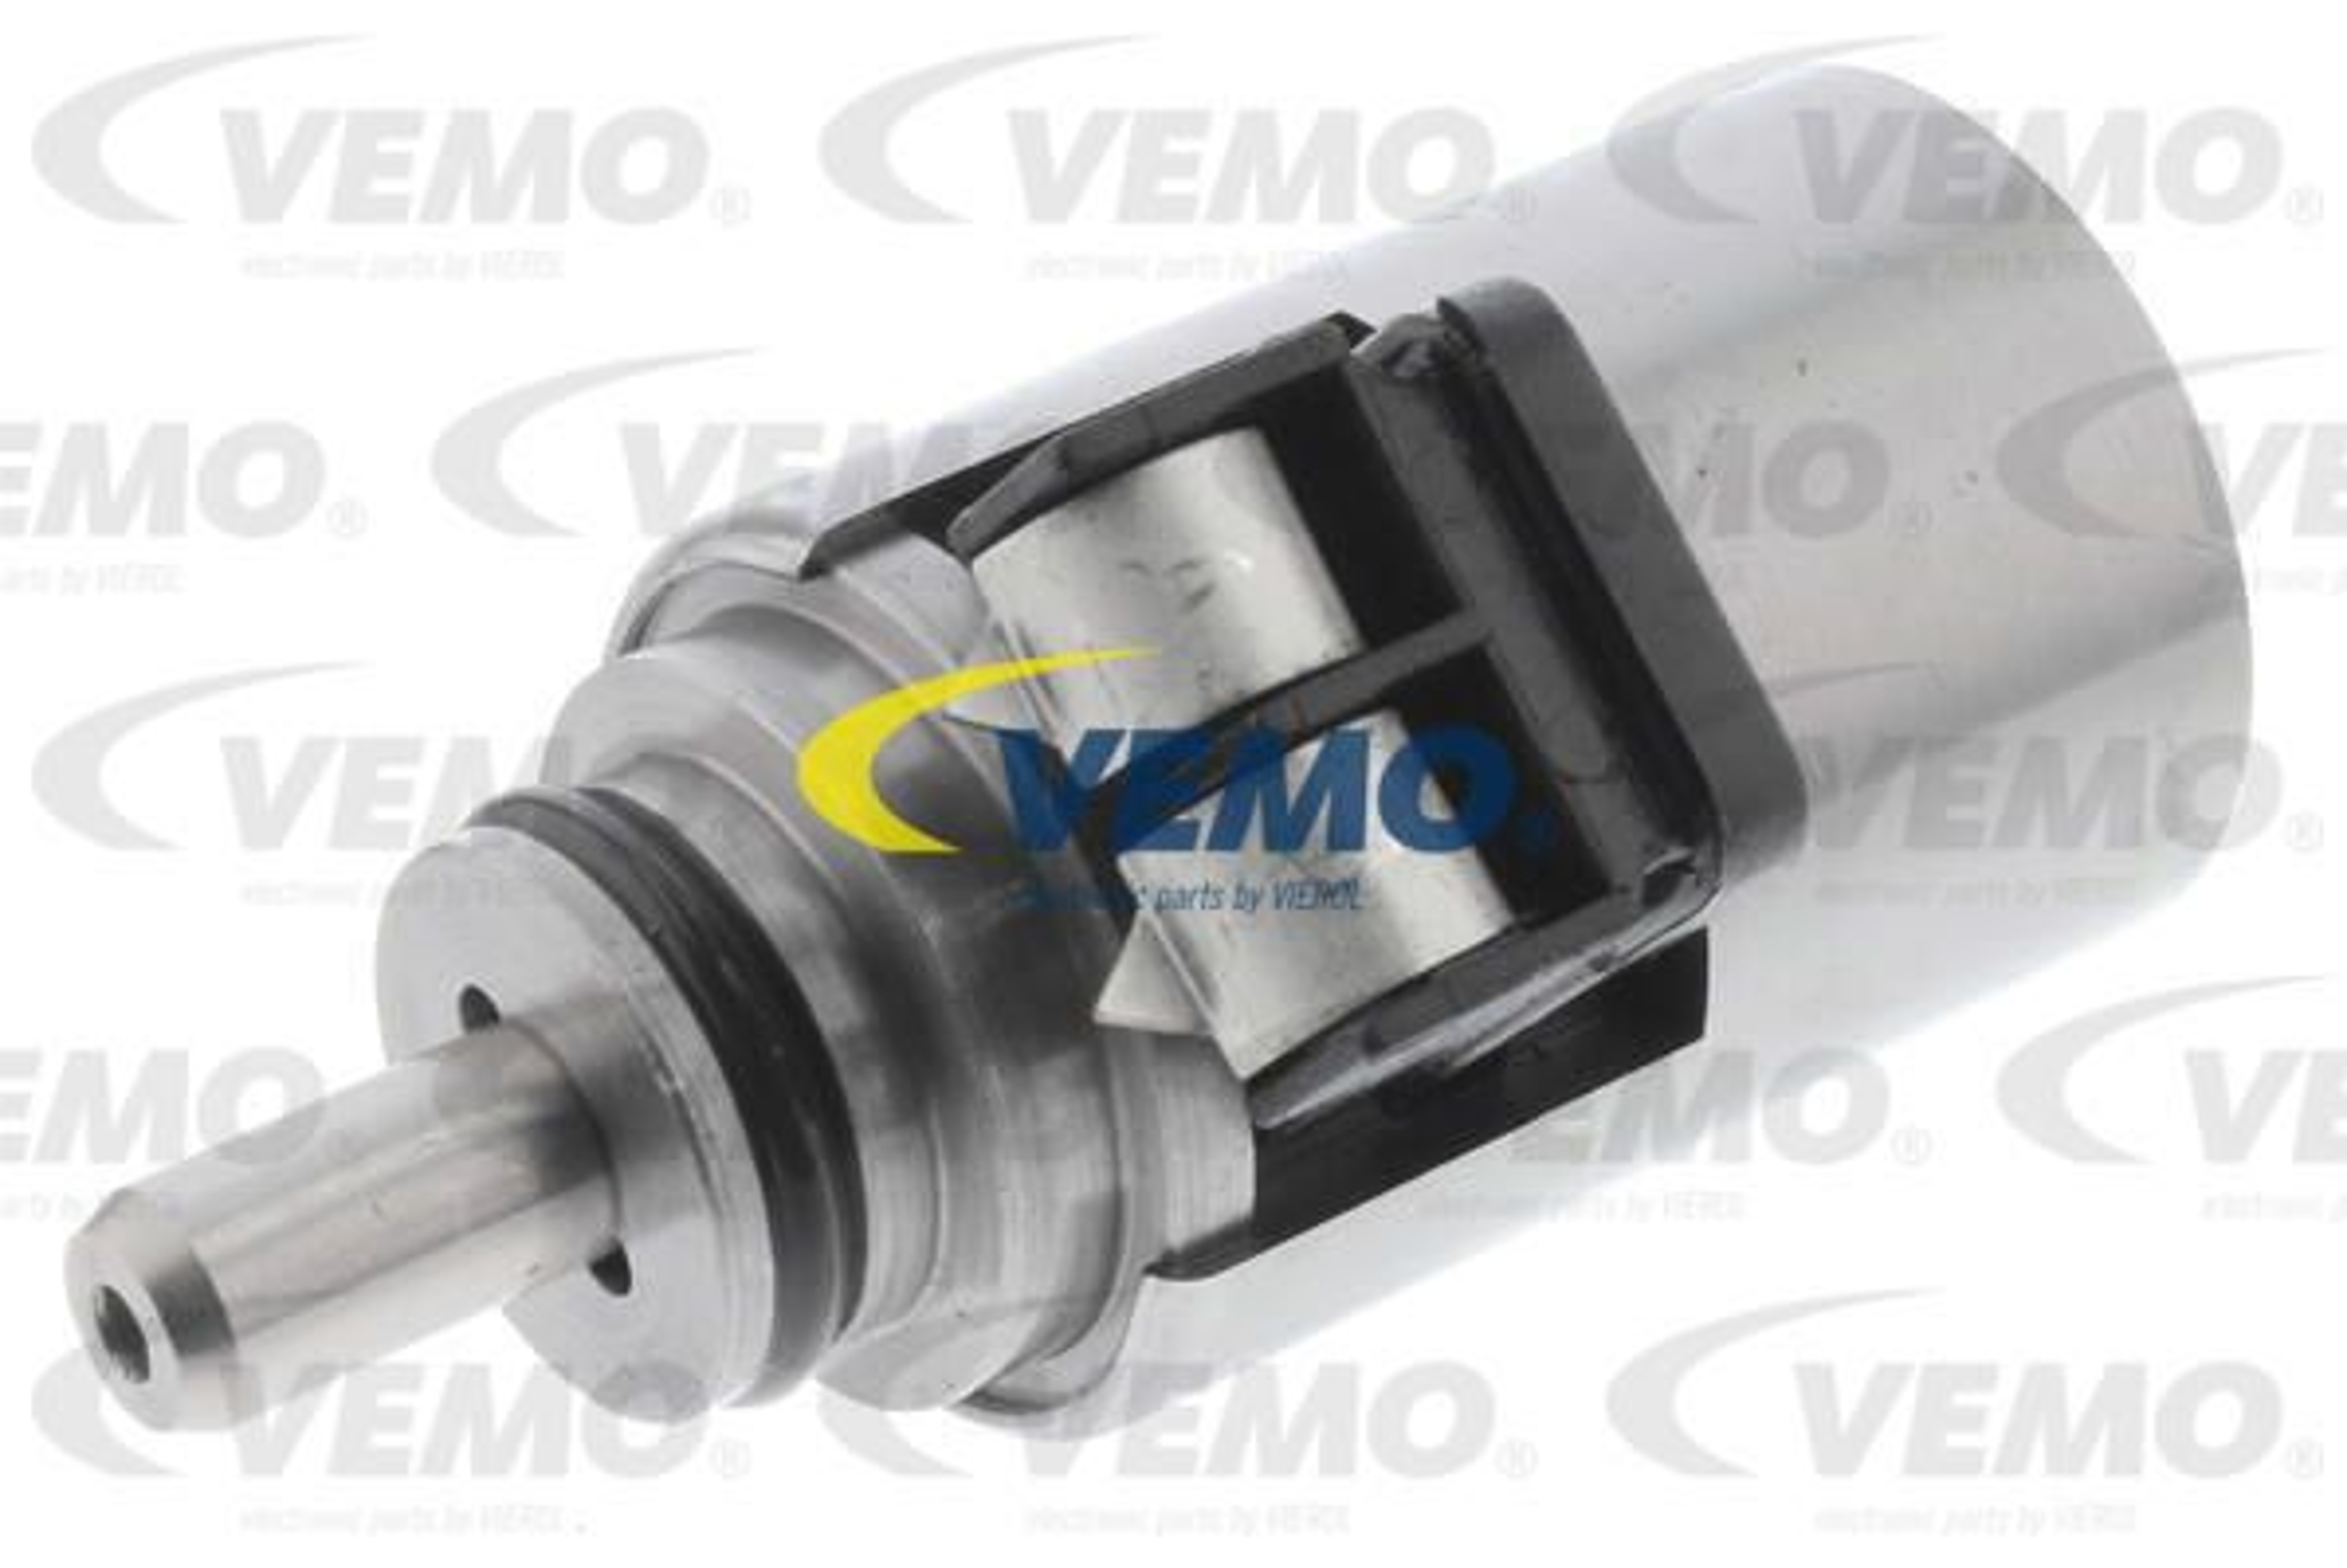 MERCEDES-BENZ C-Klasse 2021 Schaltventil, Automatikgetriebe - Original VEMO V30-77-1013